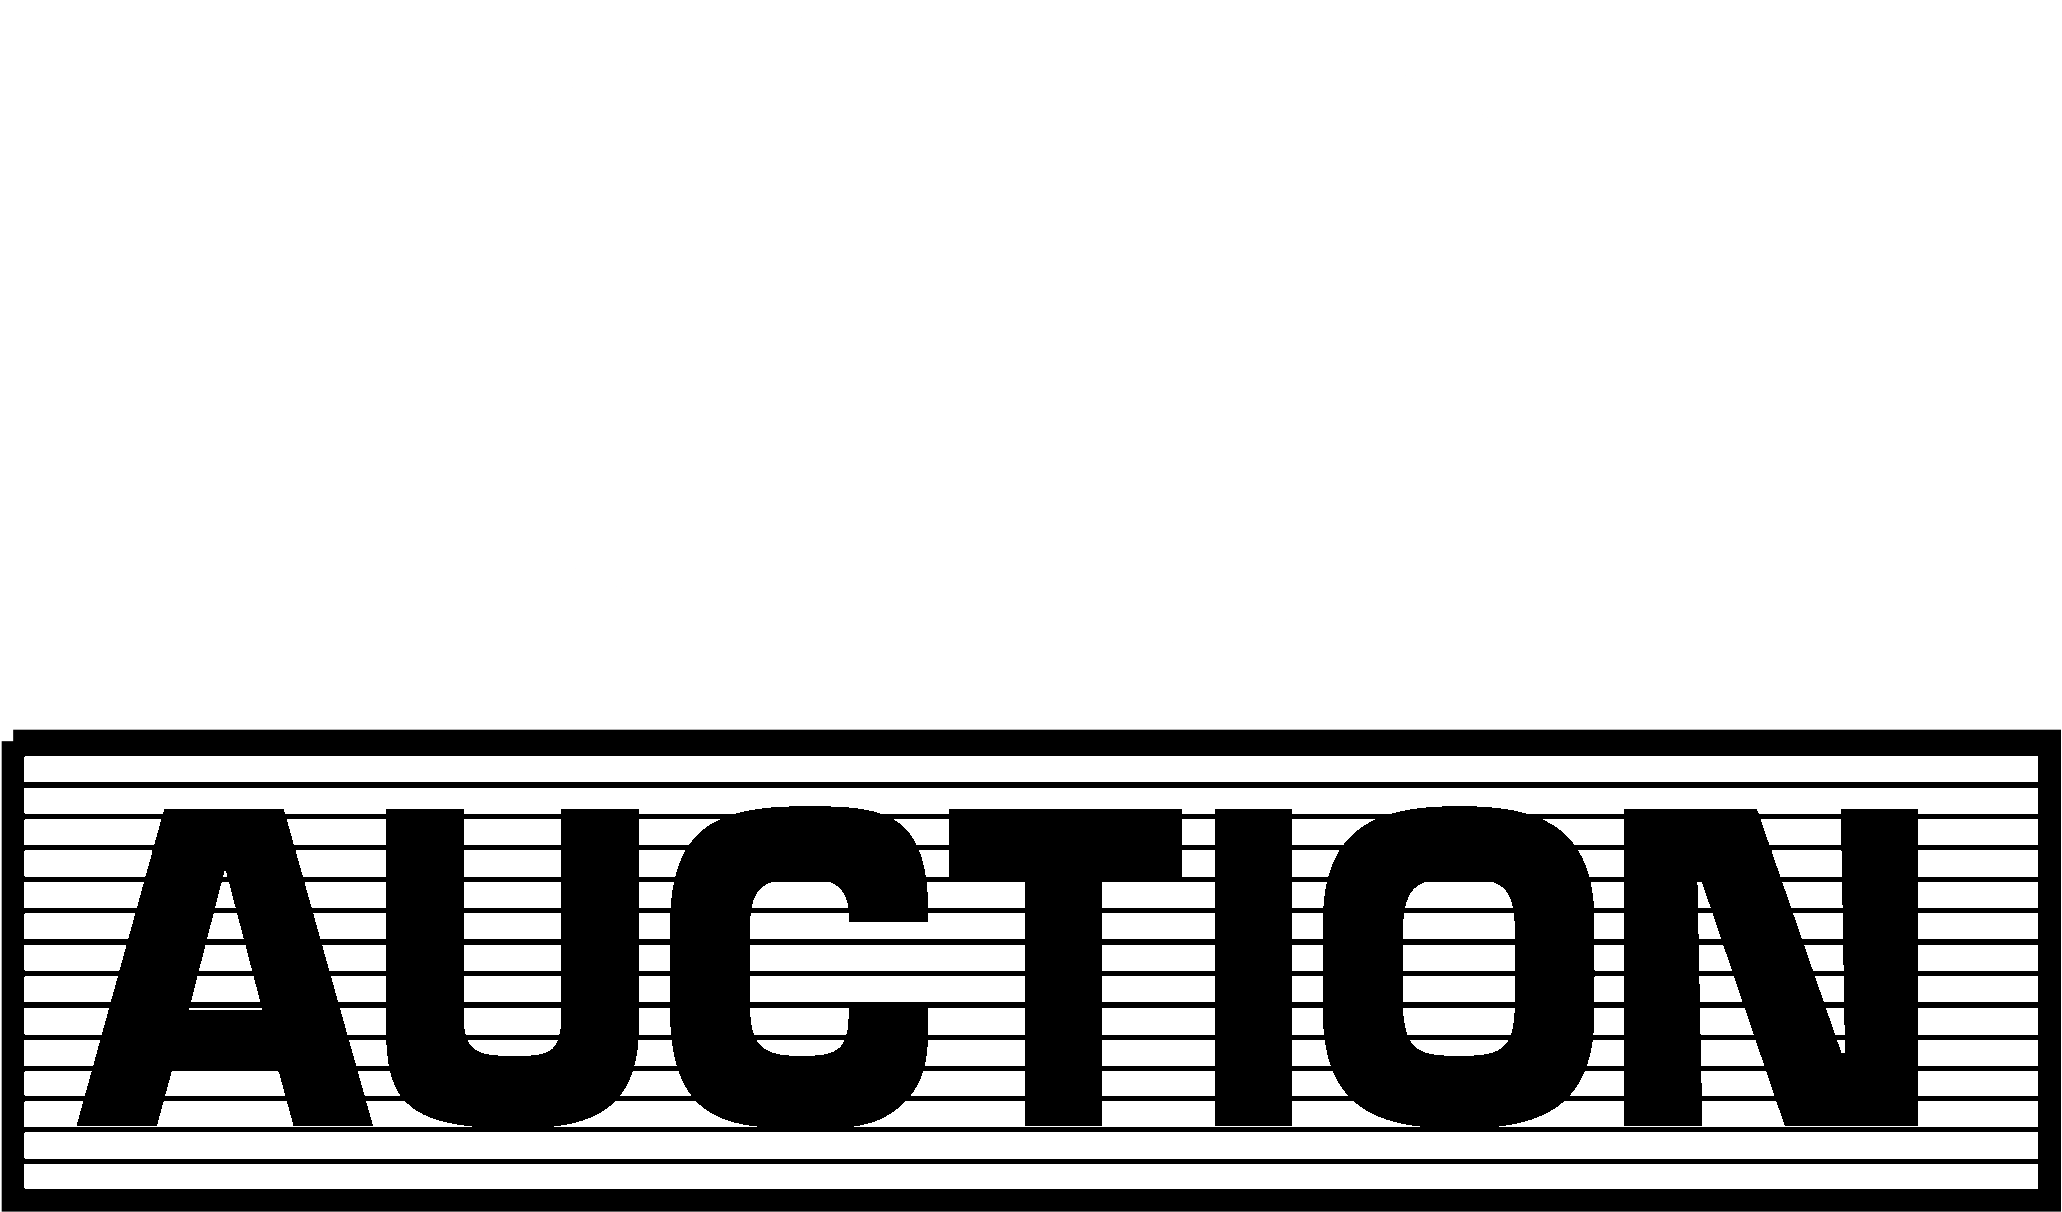 Pmi Auction Logo Black And White Auction White.